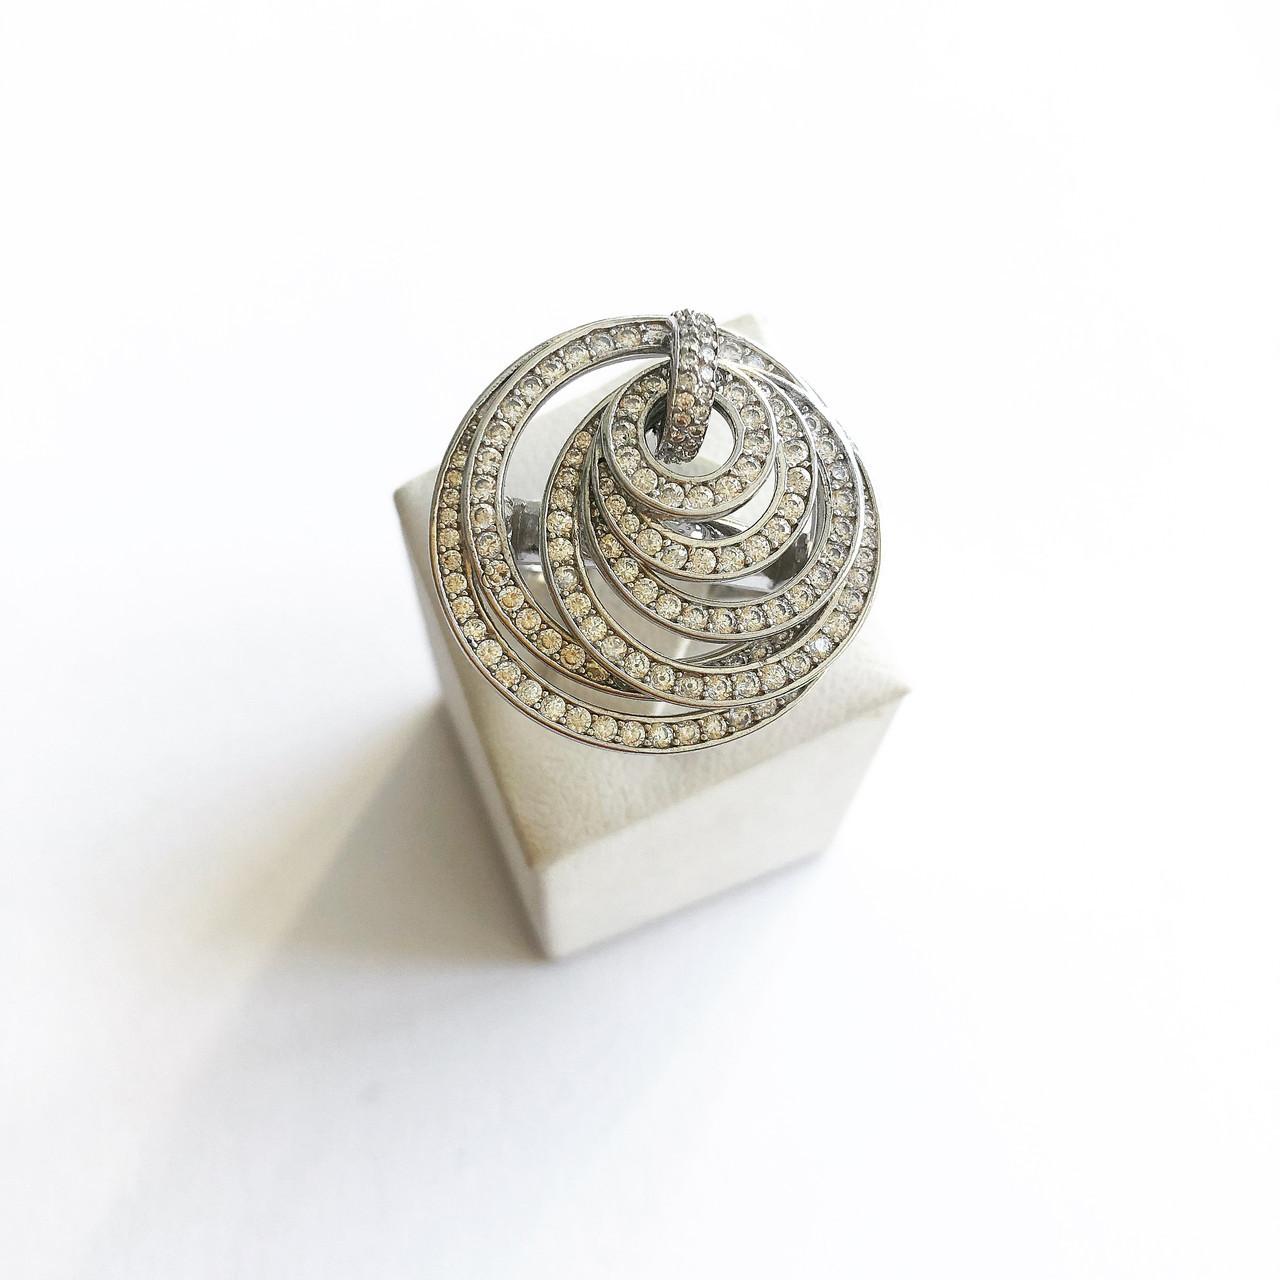 Кольцо из серебра с куб. цирконами Beauty Jewels в стиле De Grisogono (размер 18)